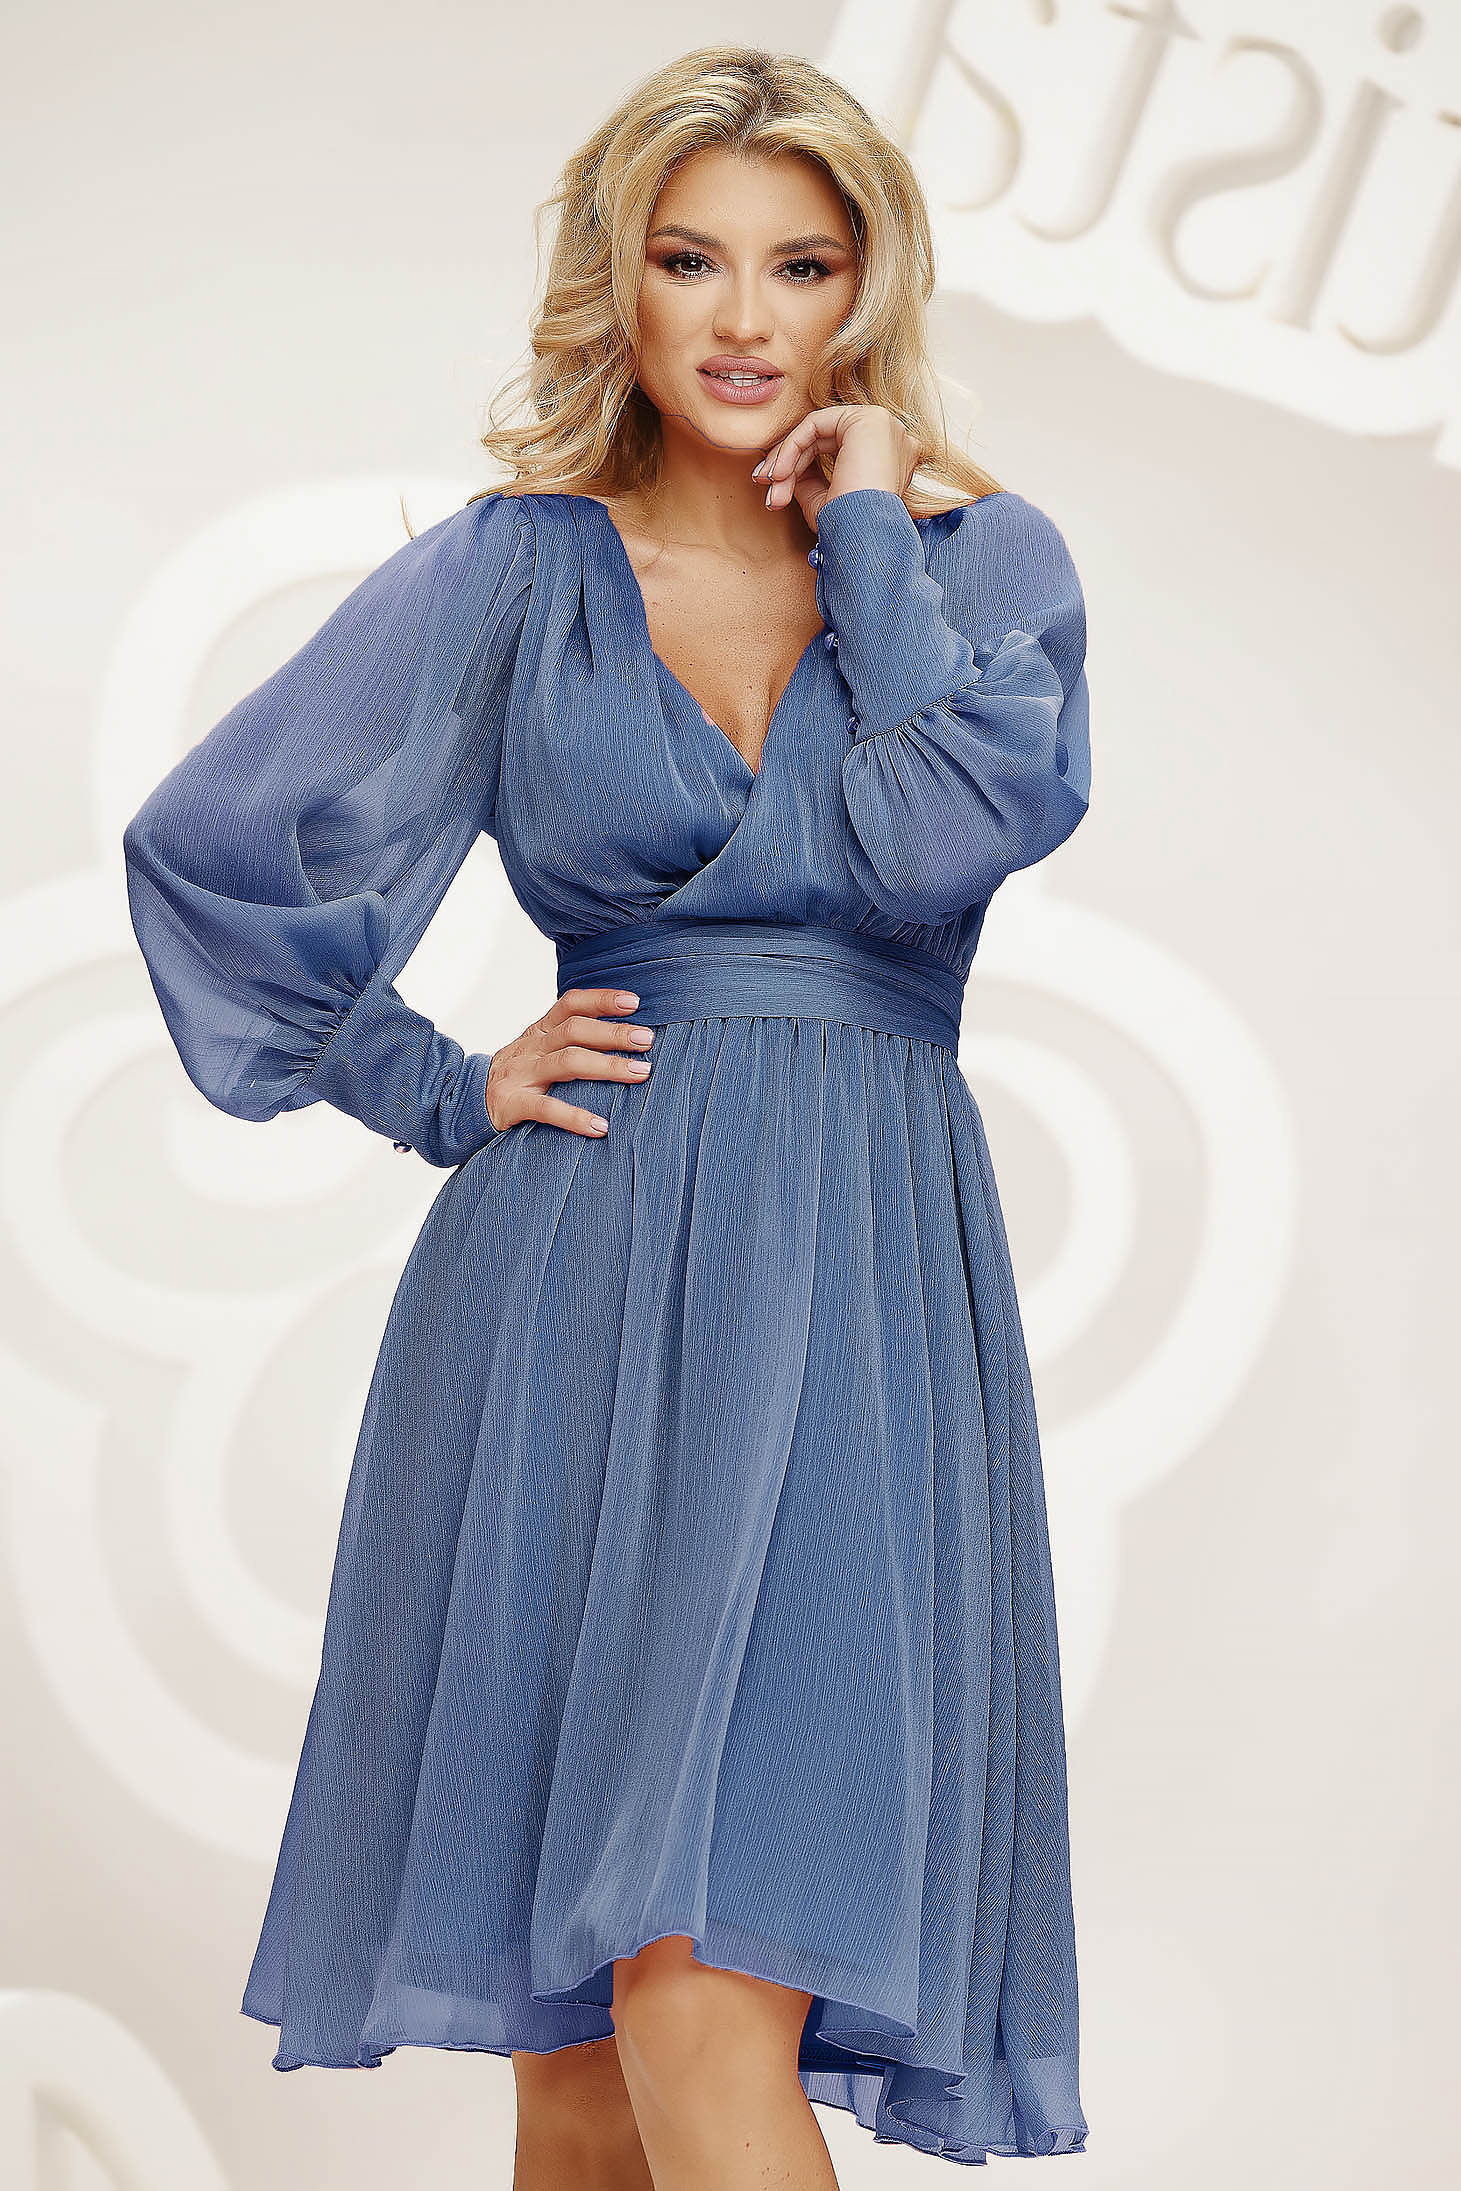 Lightblue dress cloche midi occasional light material from veil fabric wrinkled texture slightly elastic fabric